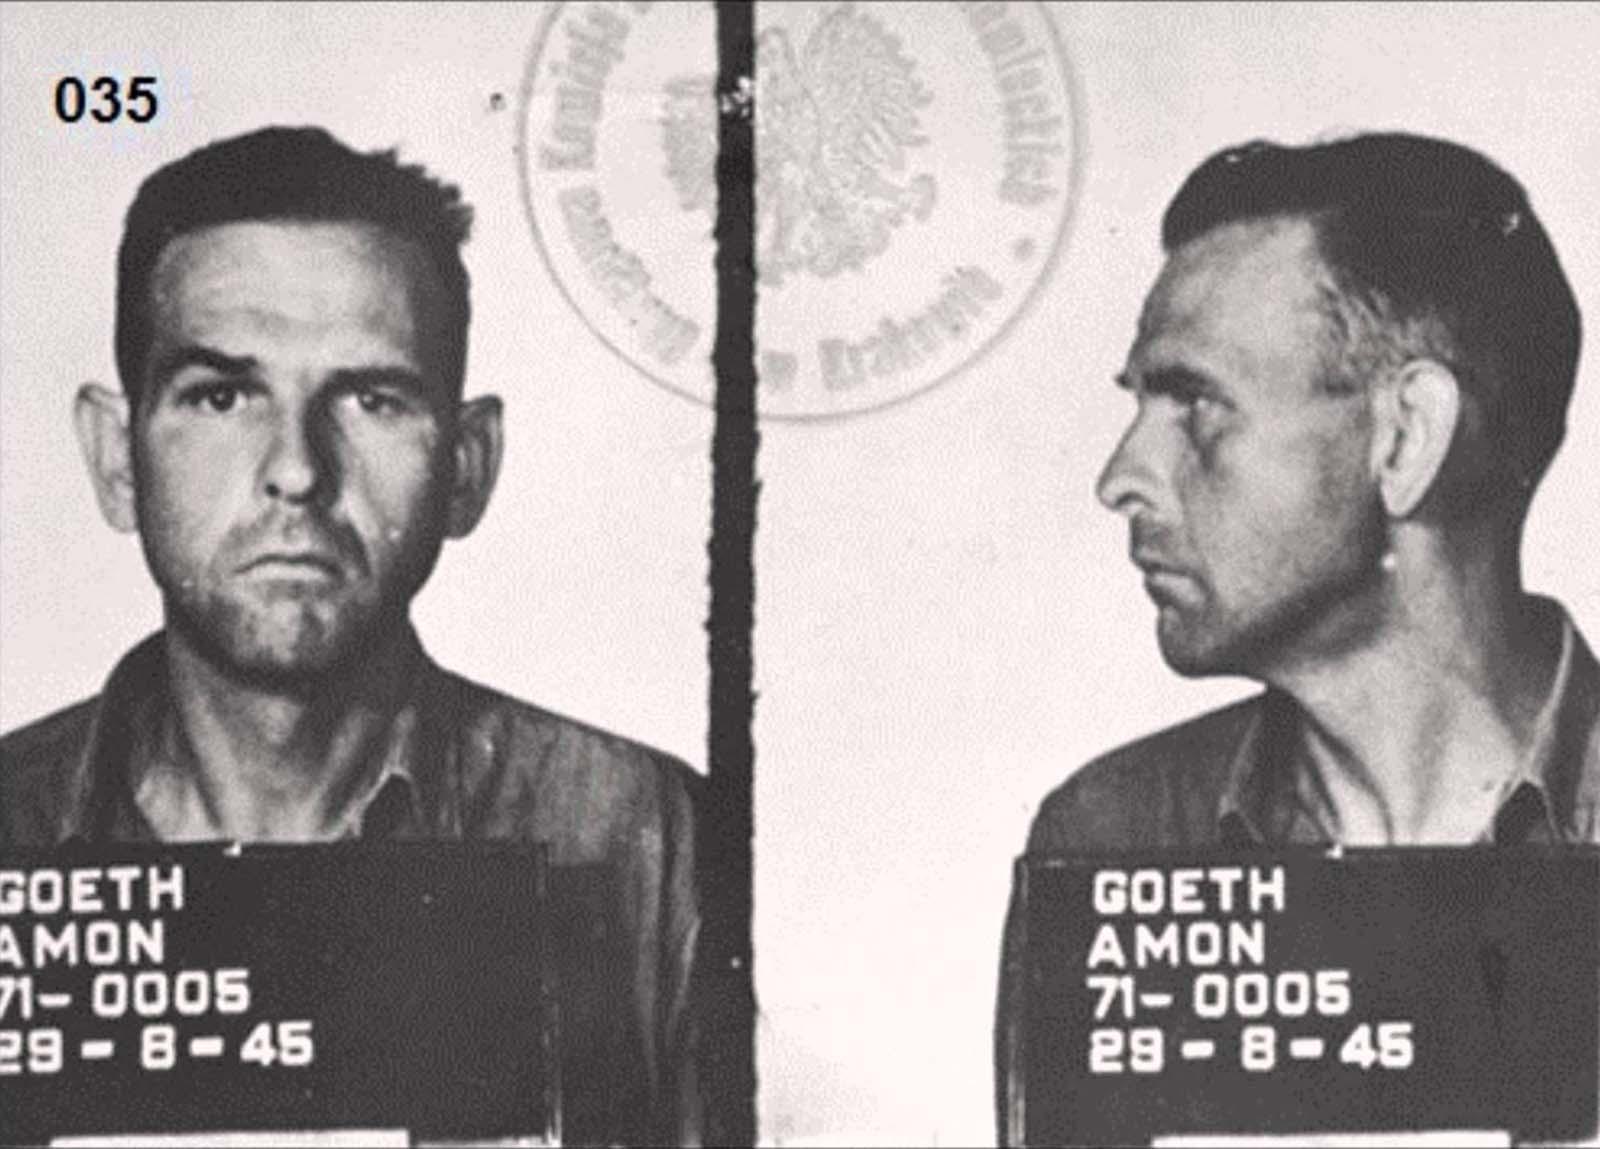 Amon Leopold Göth's mugshot, 1945.